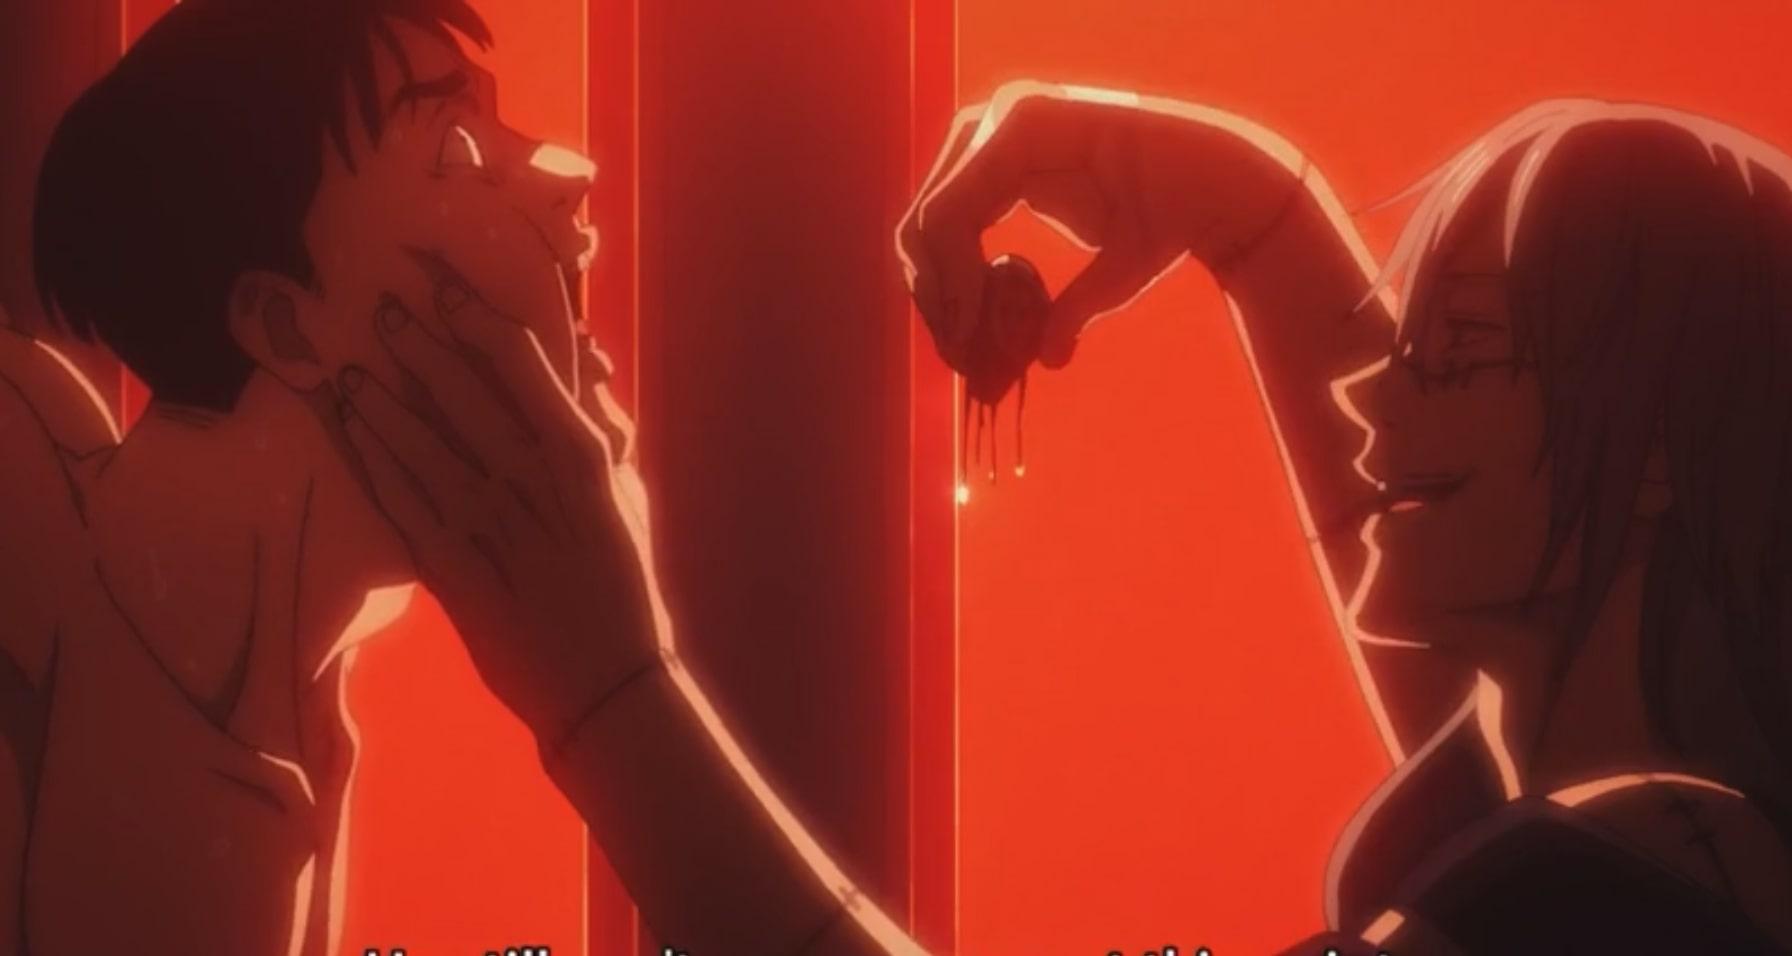 Jujutsu Kaisen Episode 23 Release date, watch online, spoilers